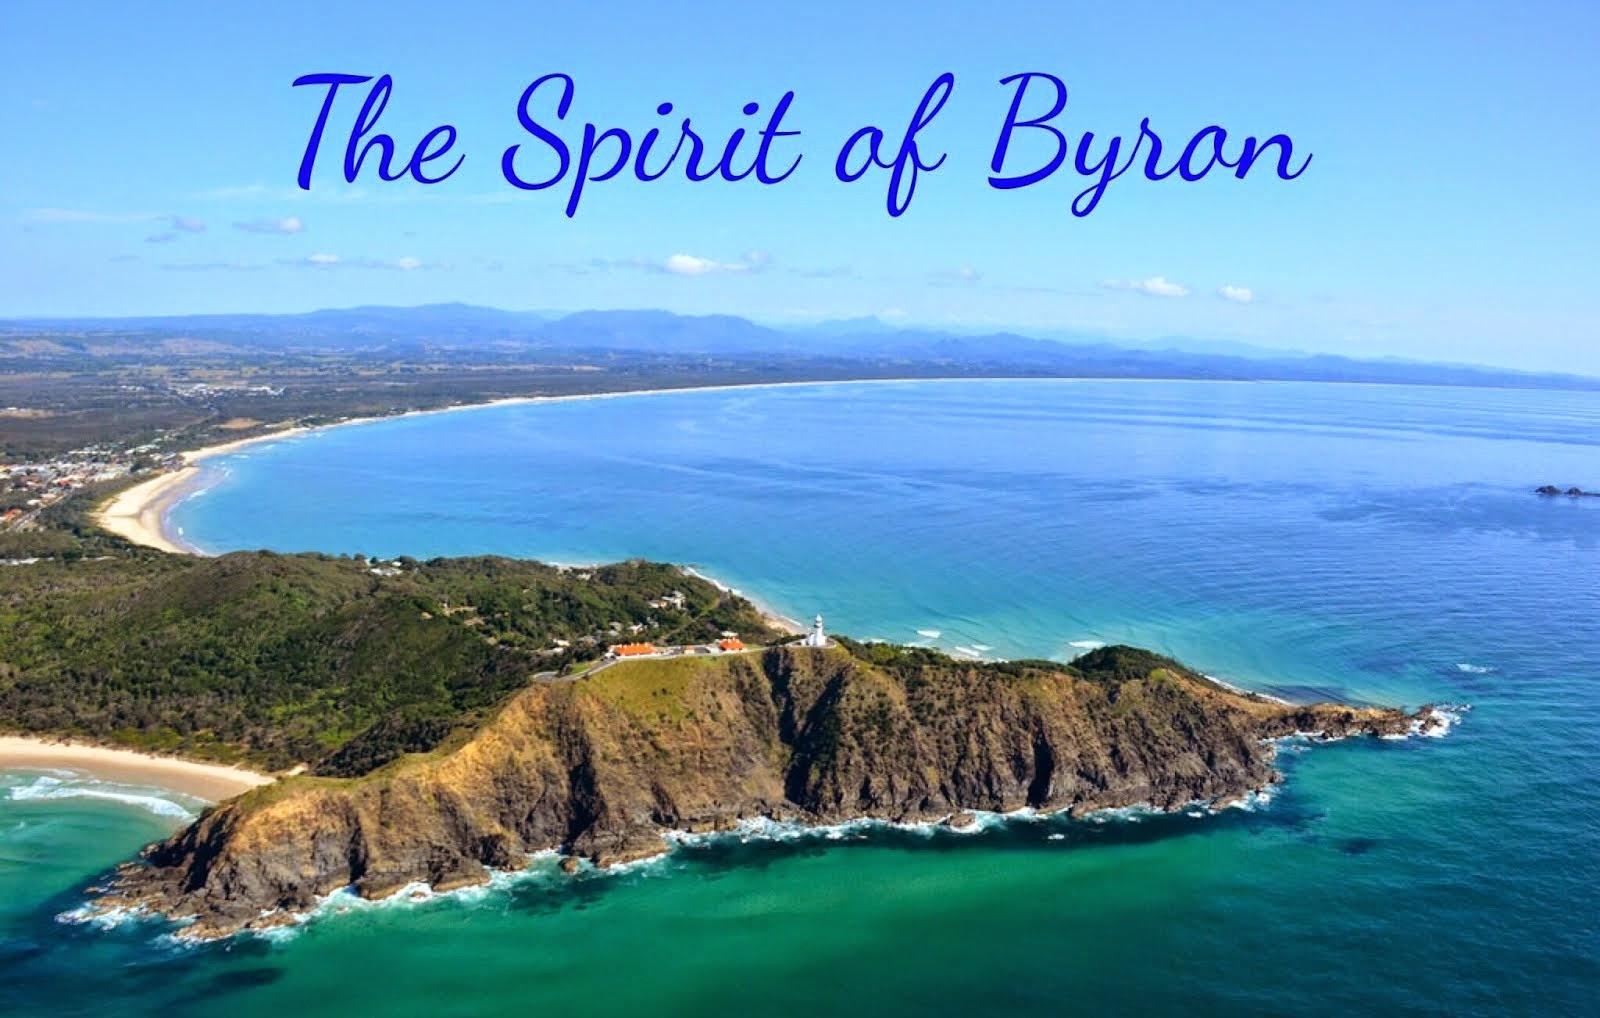 The Spirit of Byron